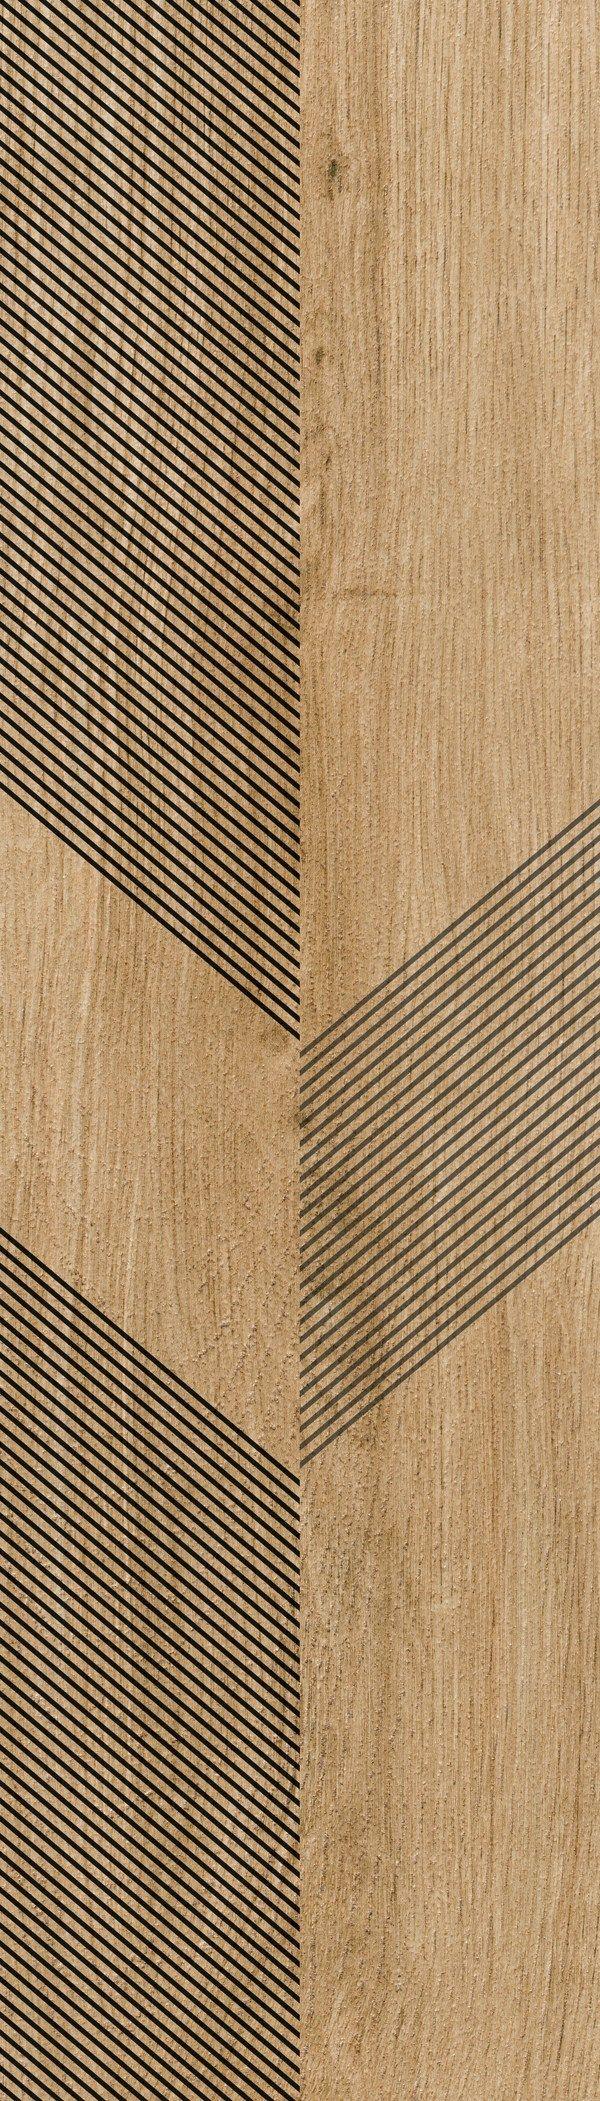 Floor tiles TYPE-32 SLIMTECH slimtech Collection by LEA CERAMICHE   design Diego Grandi